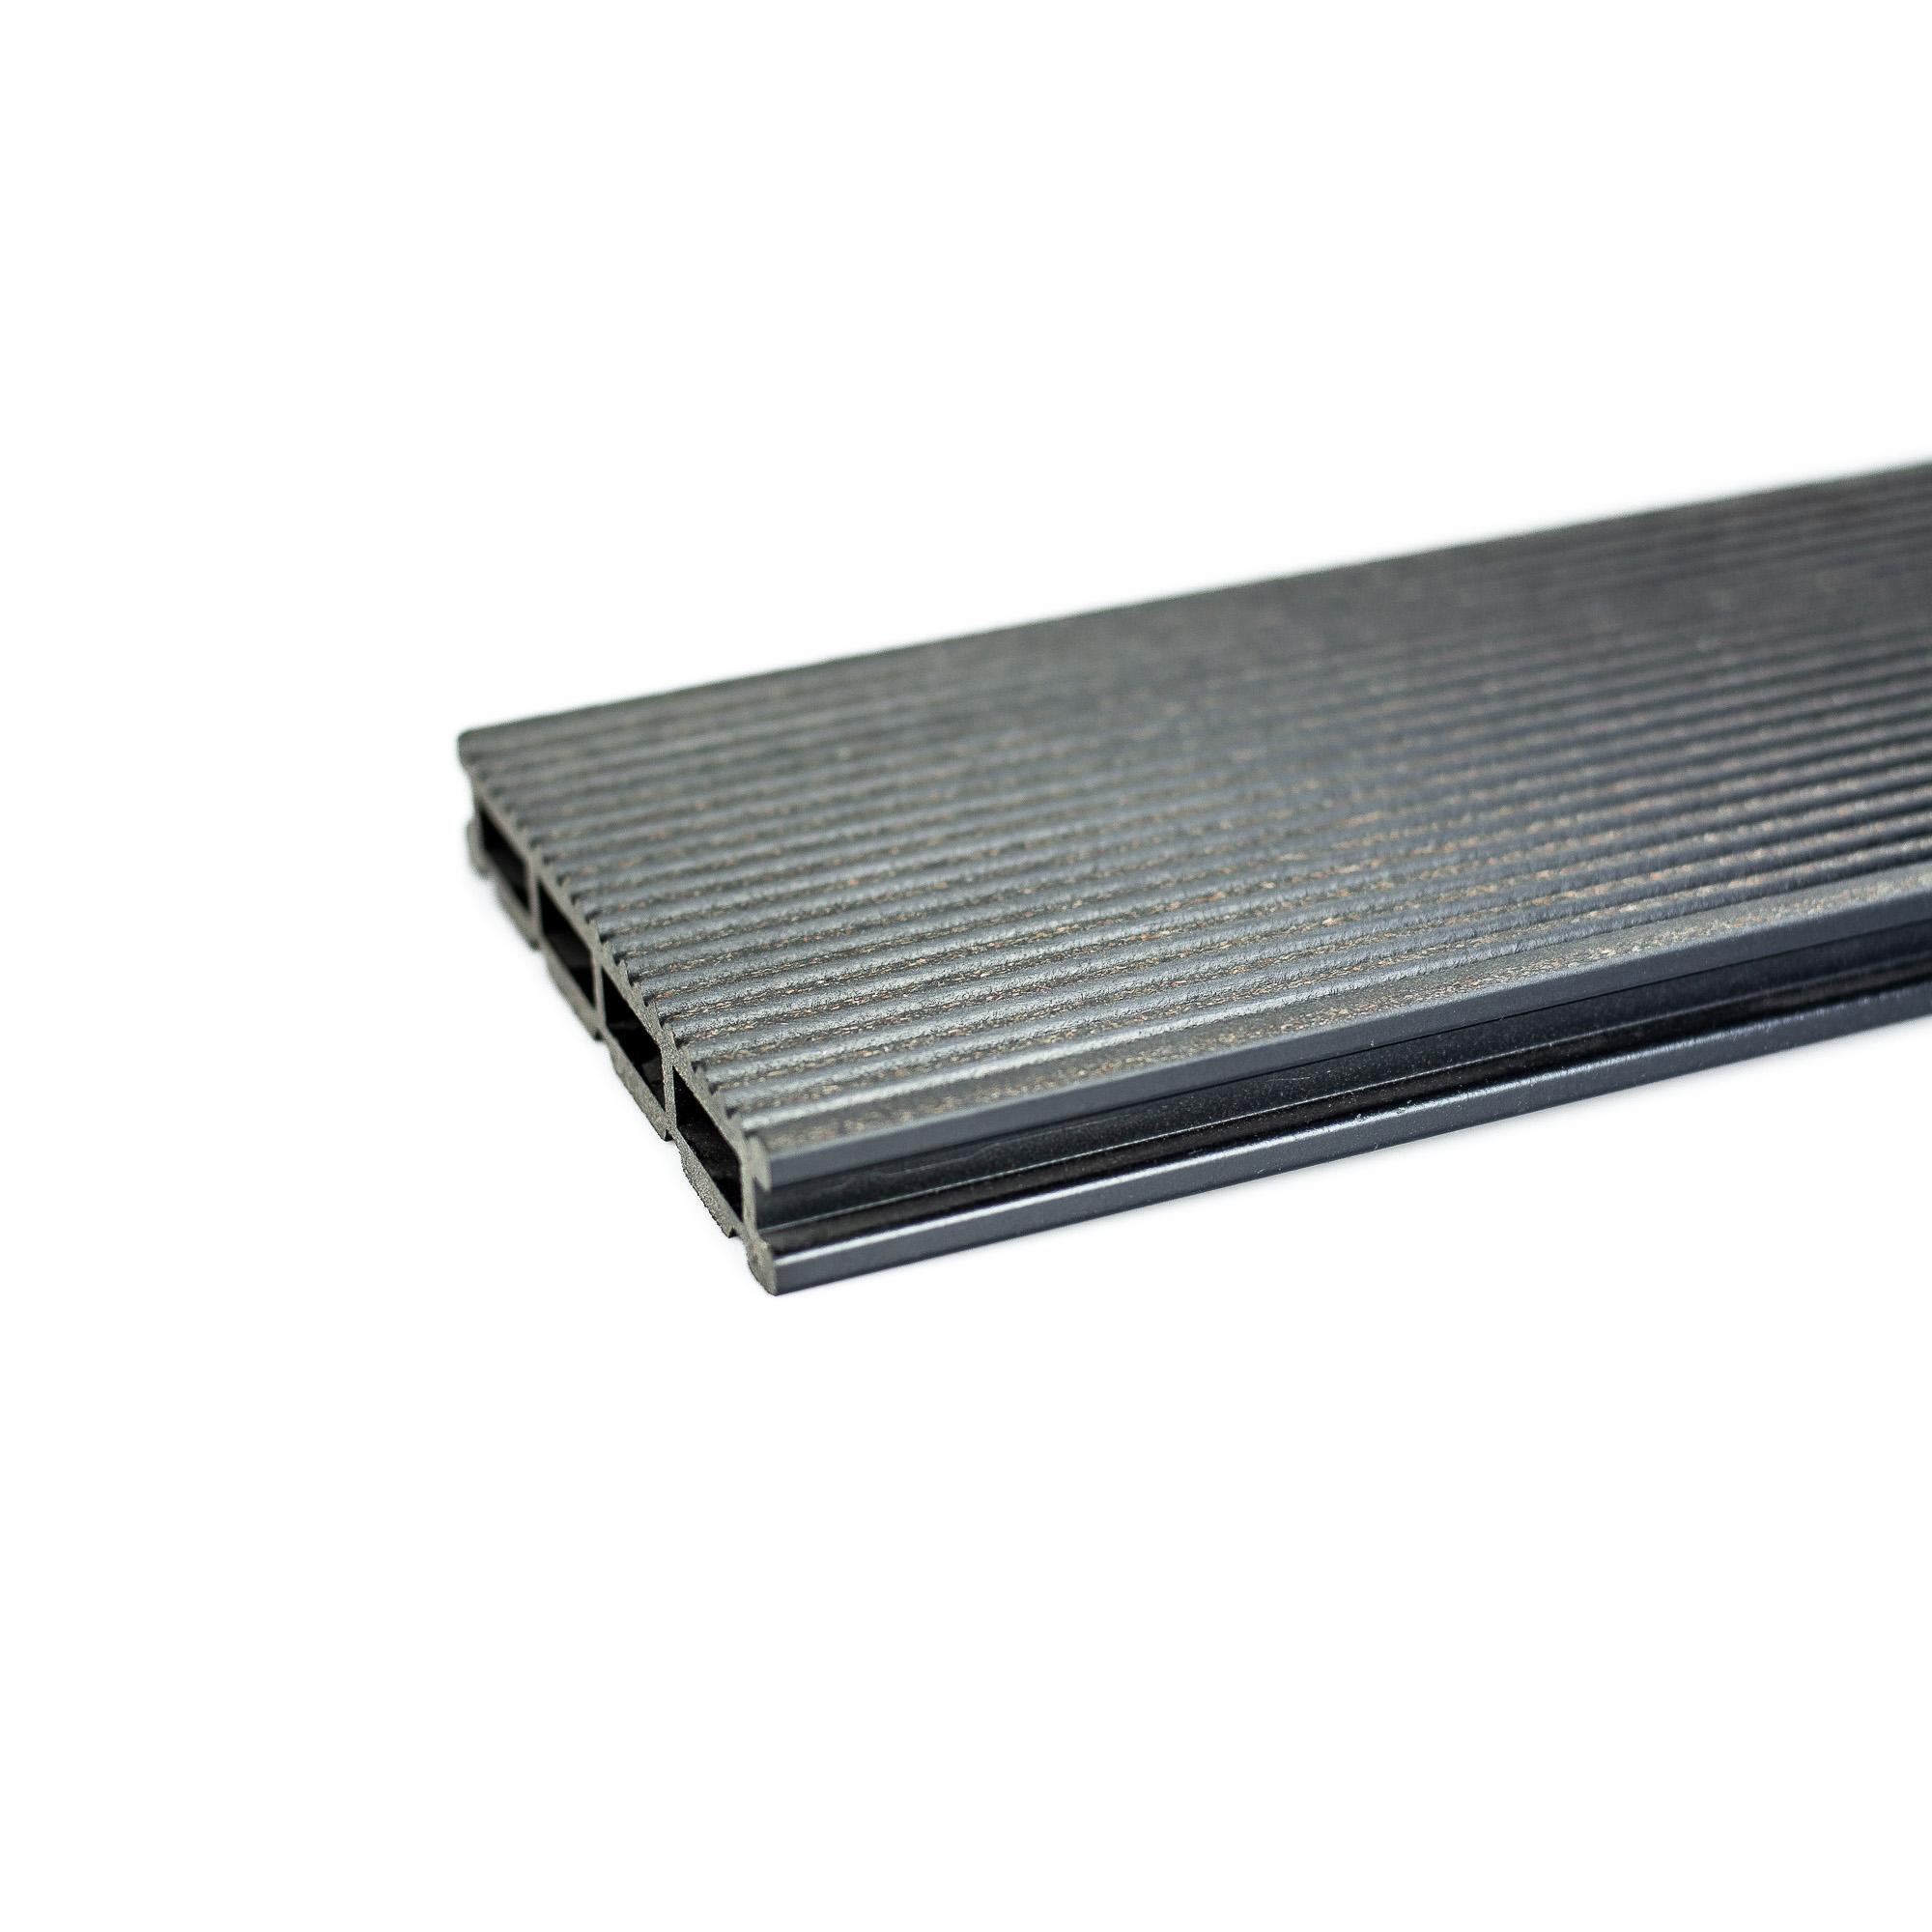 Profil pentru terasa WPC, gri, 21 x 140 x 2400 mm imagine MatHaus